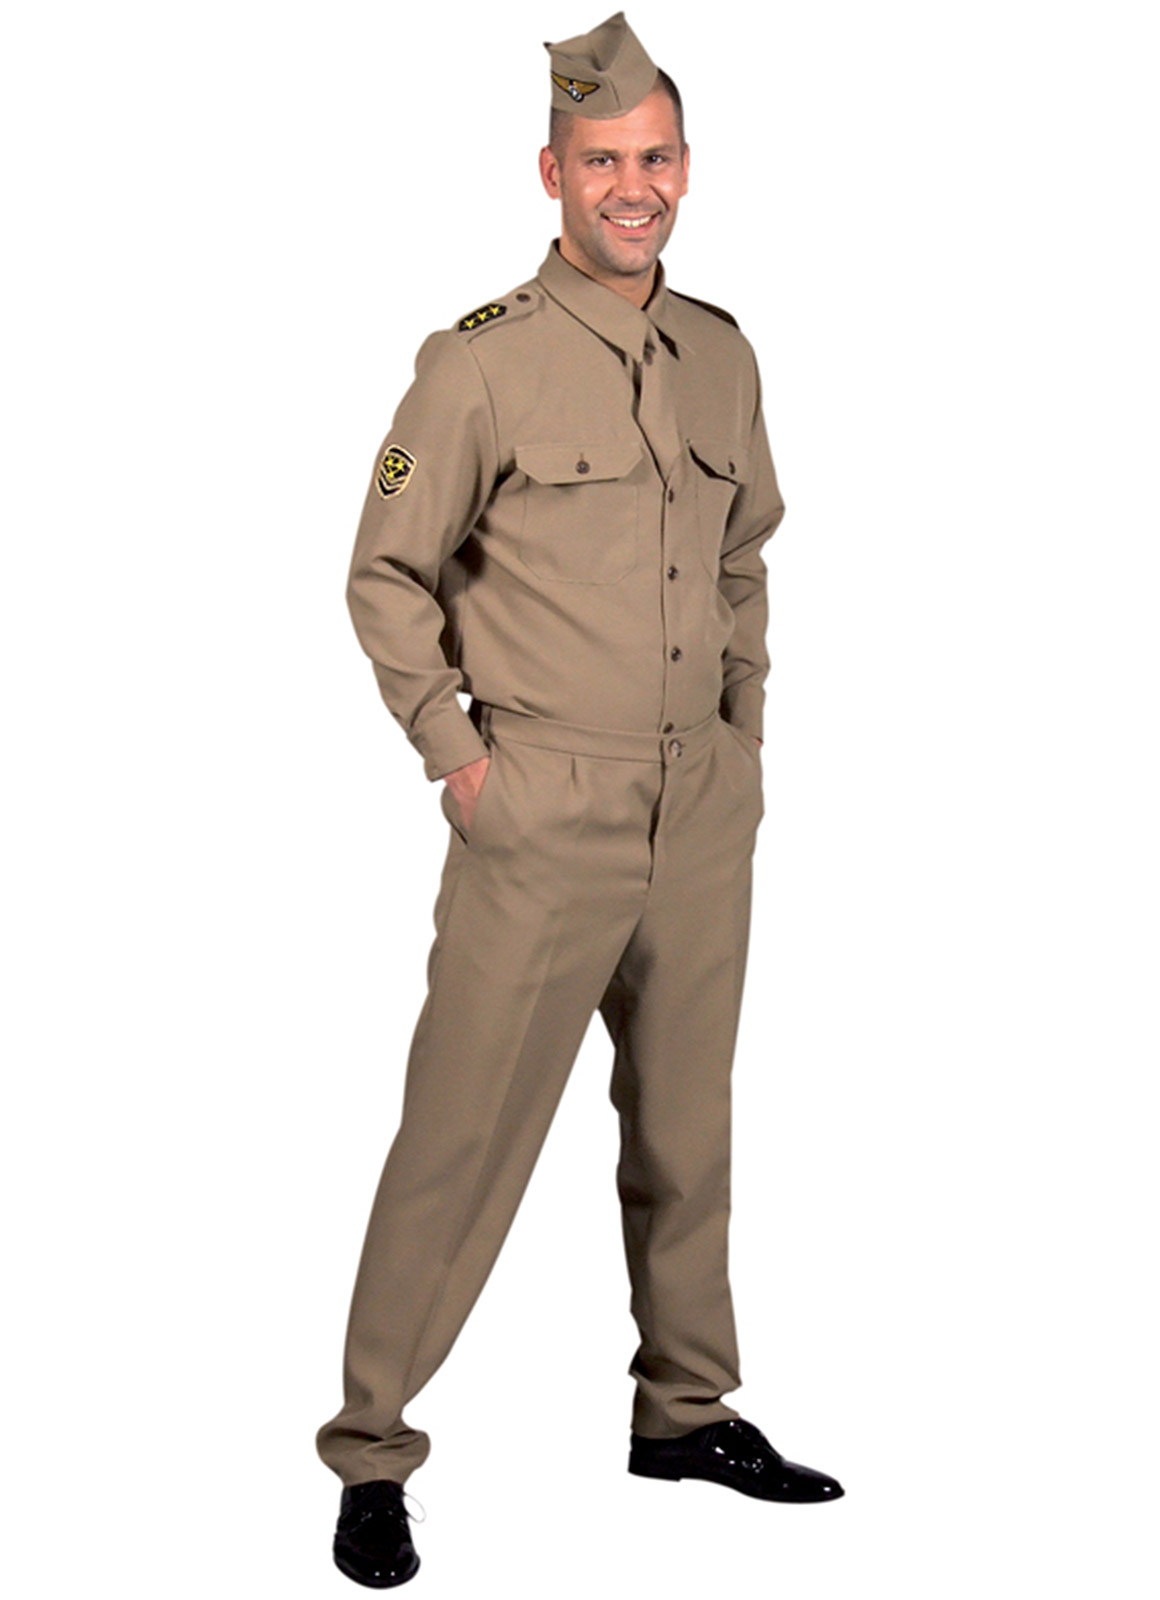 1940's Gi Elvis/ Army